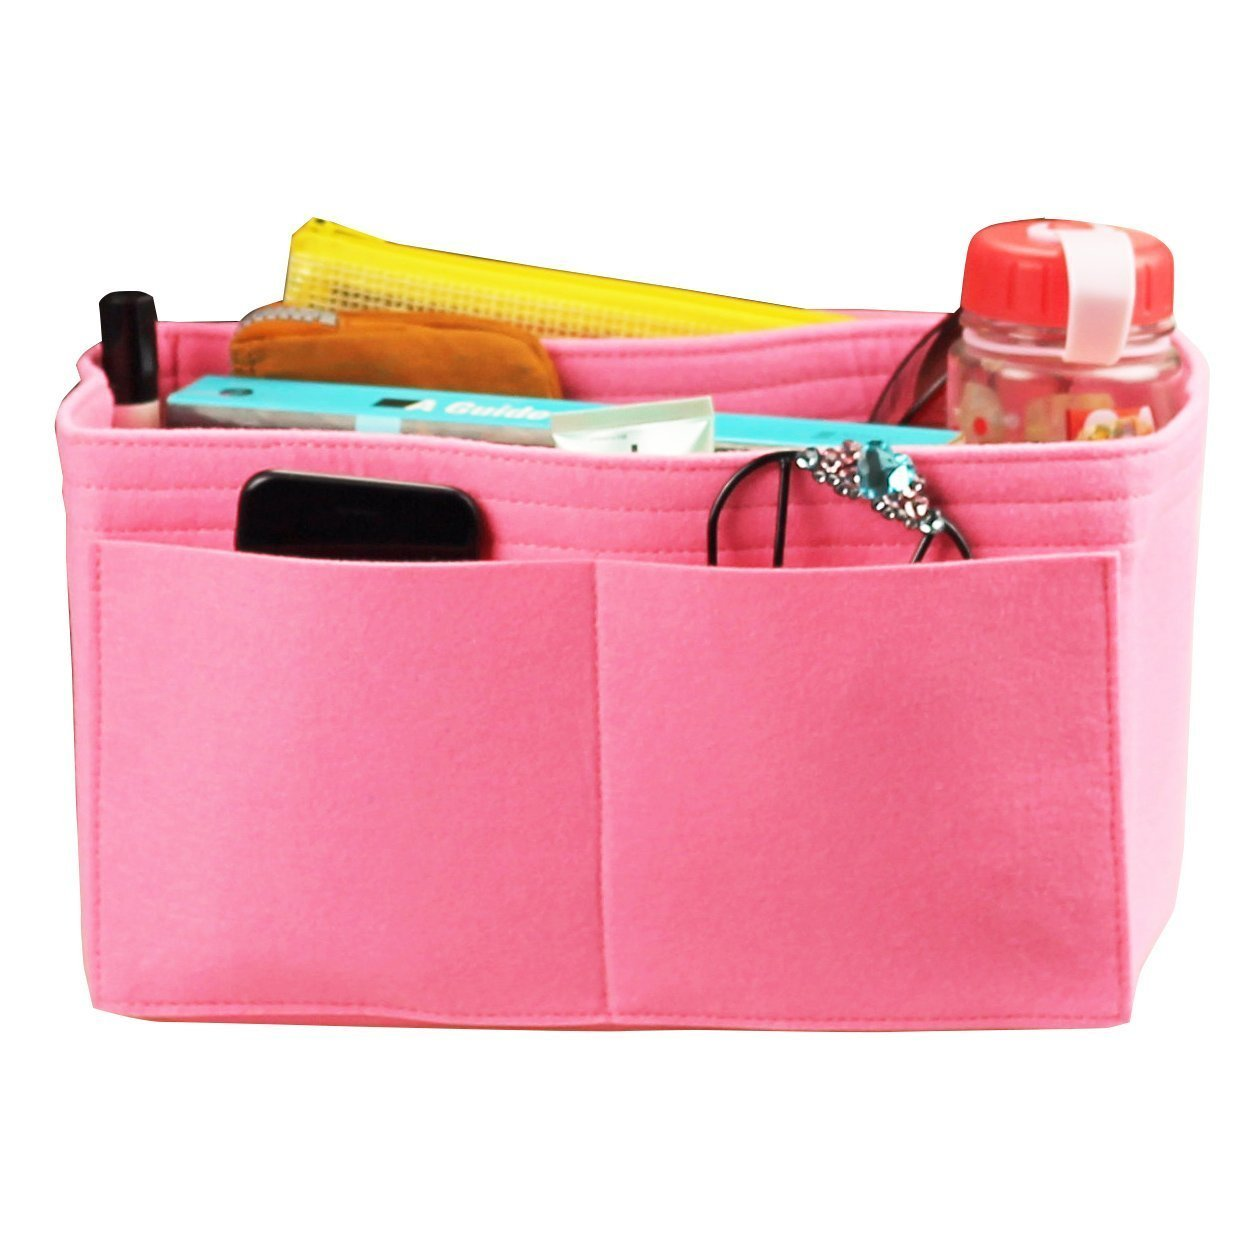 Felt Tote Organizer, Bag in Bag, Wool Purse Insert, Customized Tote Organize, Cosmetic Makeup Diaper Handbag